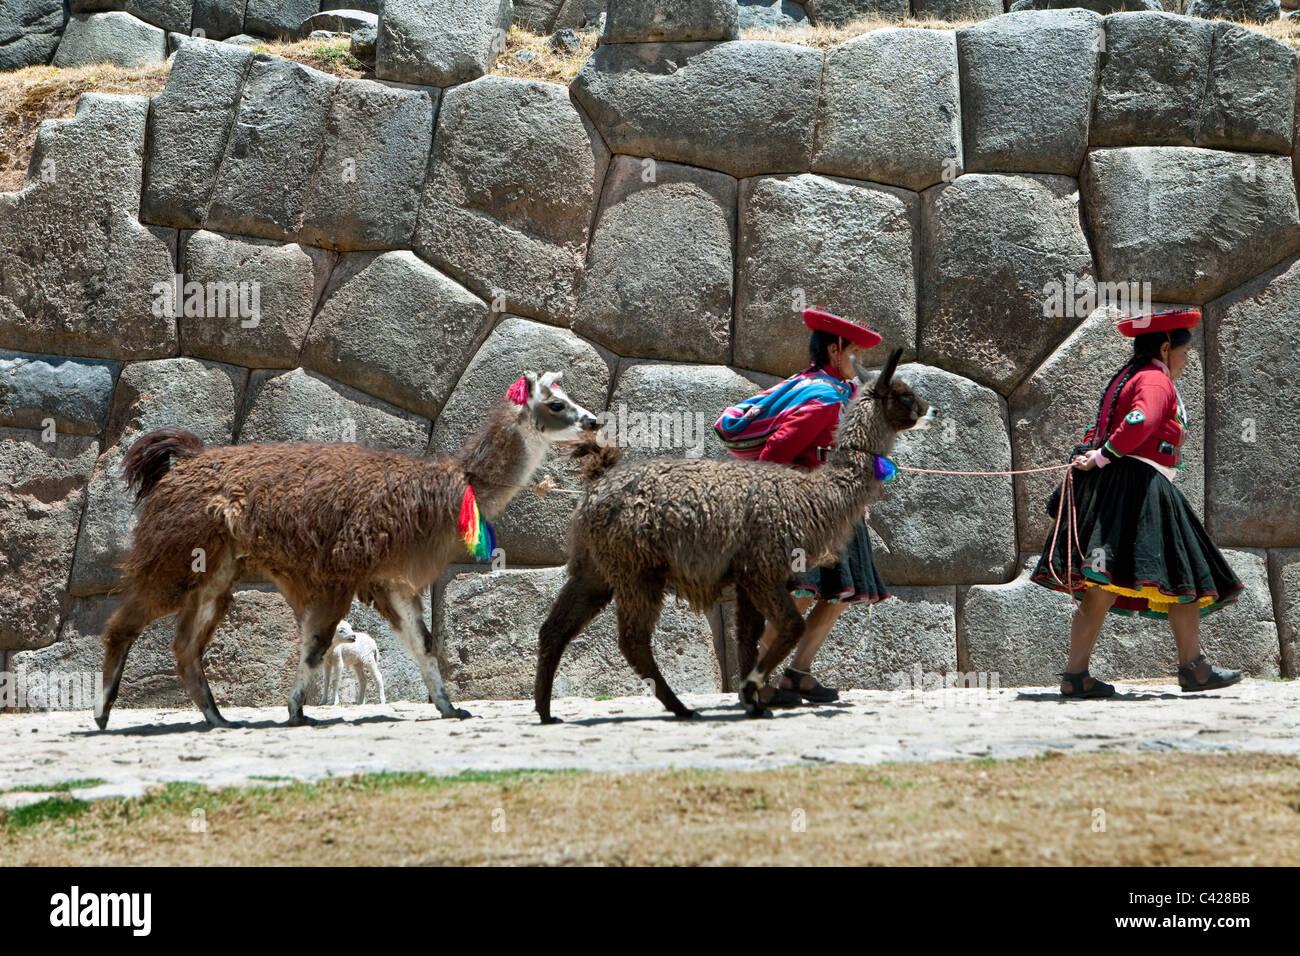 Il Perù, Cusco Cuzco, Saqsayhuaman, Sacsayhuaman, Sacsaywaman. Le donne indiane con lama e alpaca. UNESCO  Immagini Stock